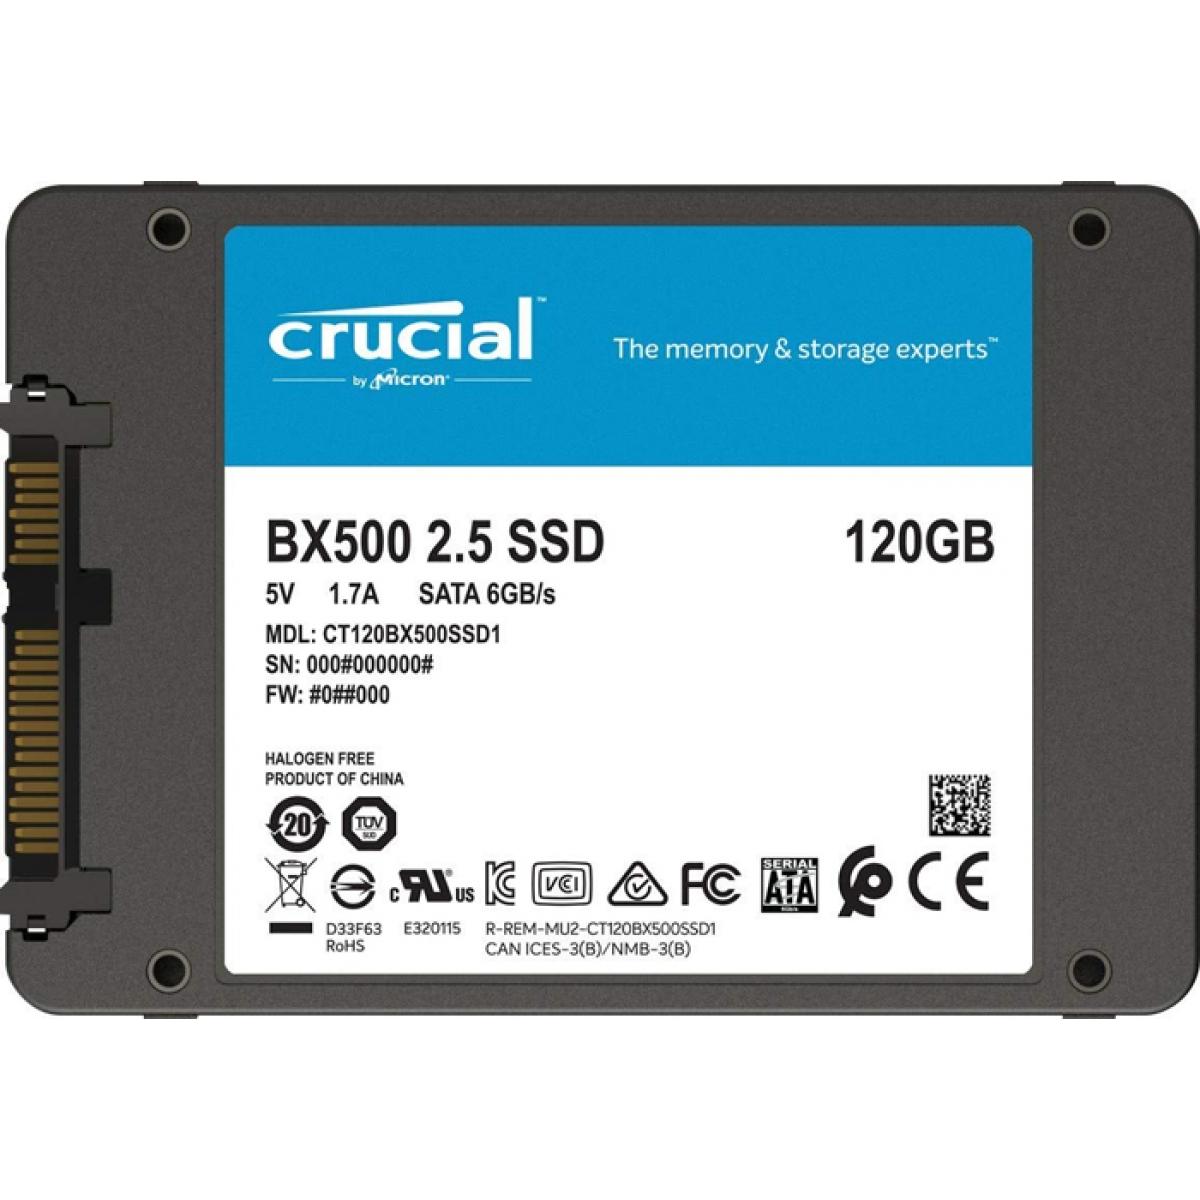 SSD Crucial BX500, 120GB, Sata III, Leitura 540MBs Gravação 500MBs, CT120BX500SSD1